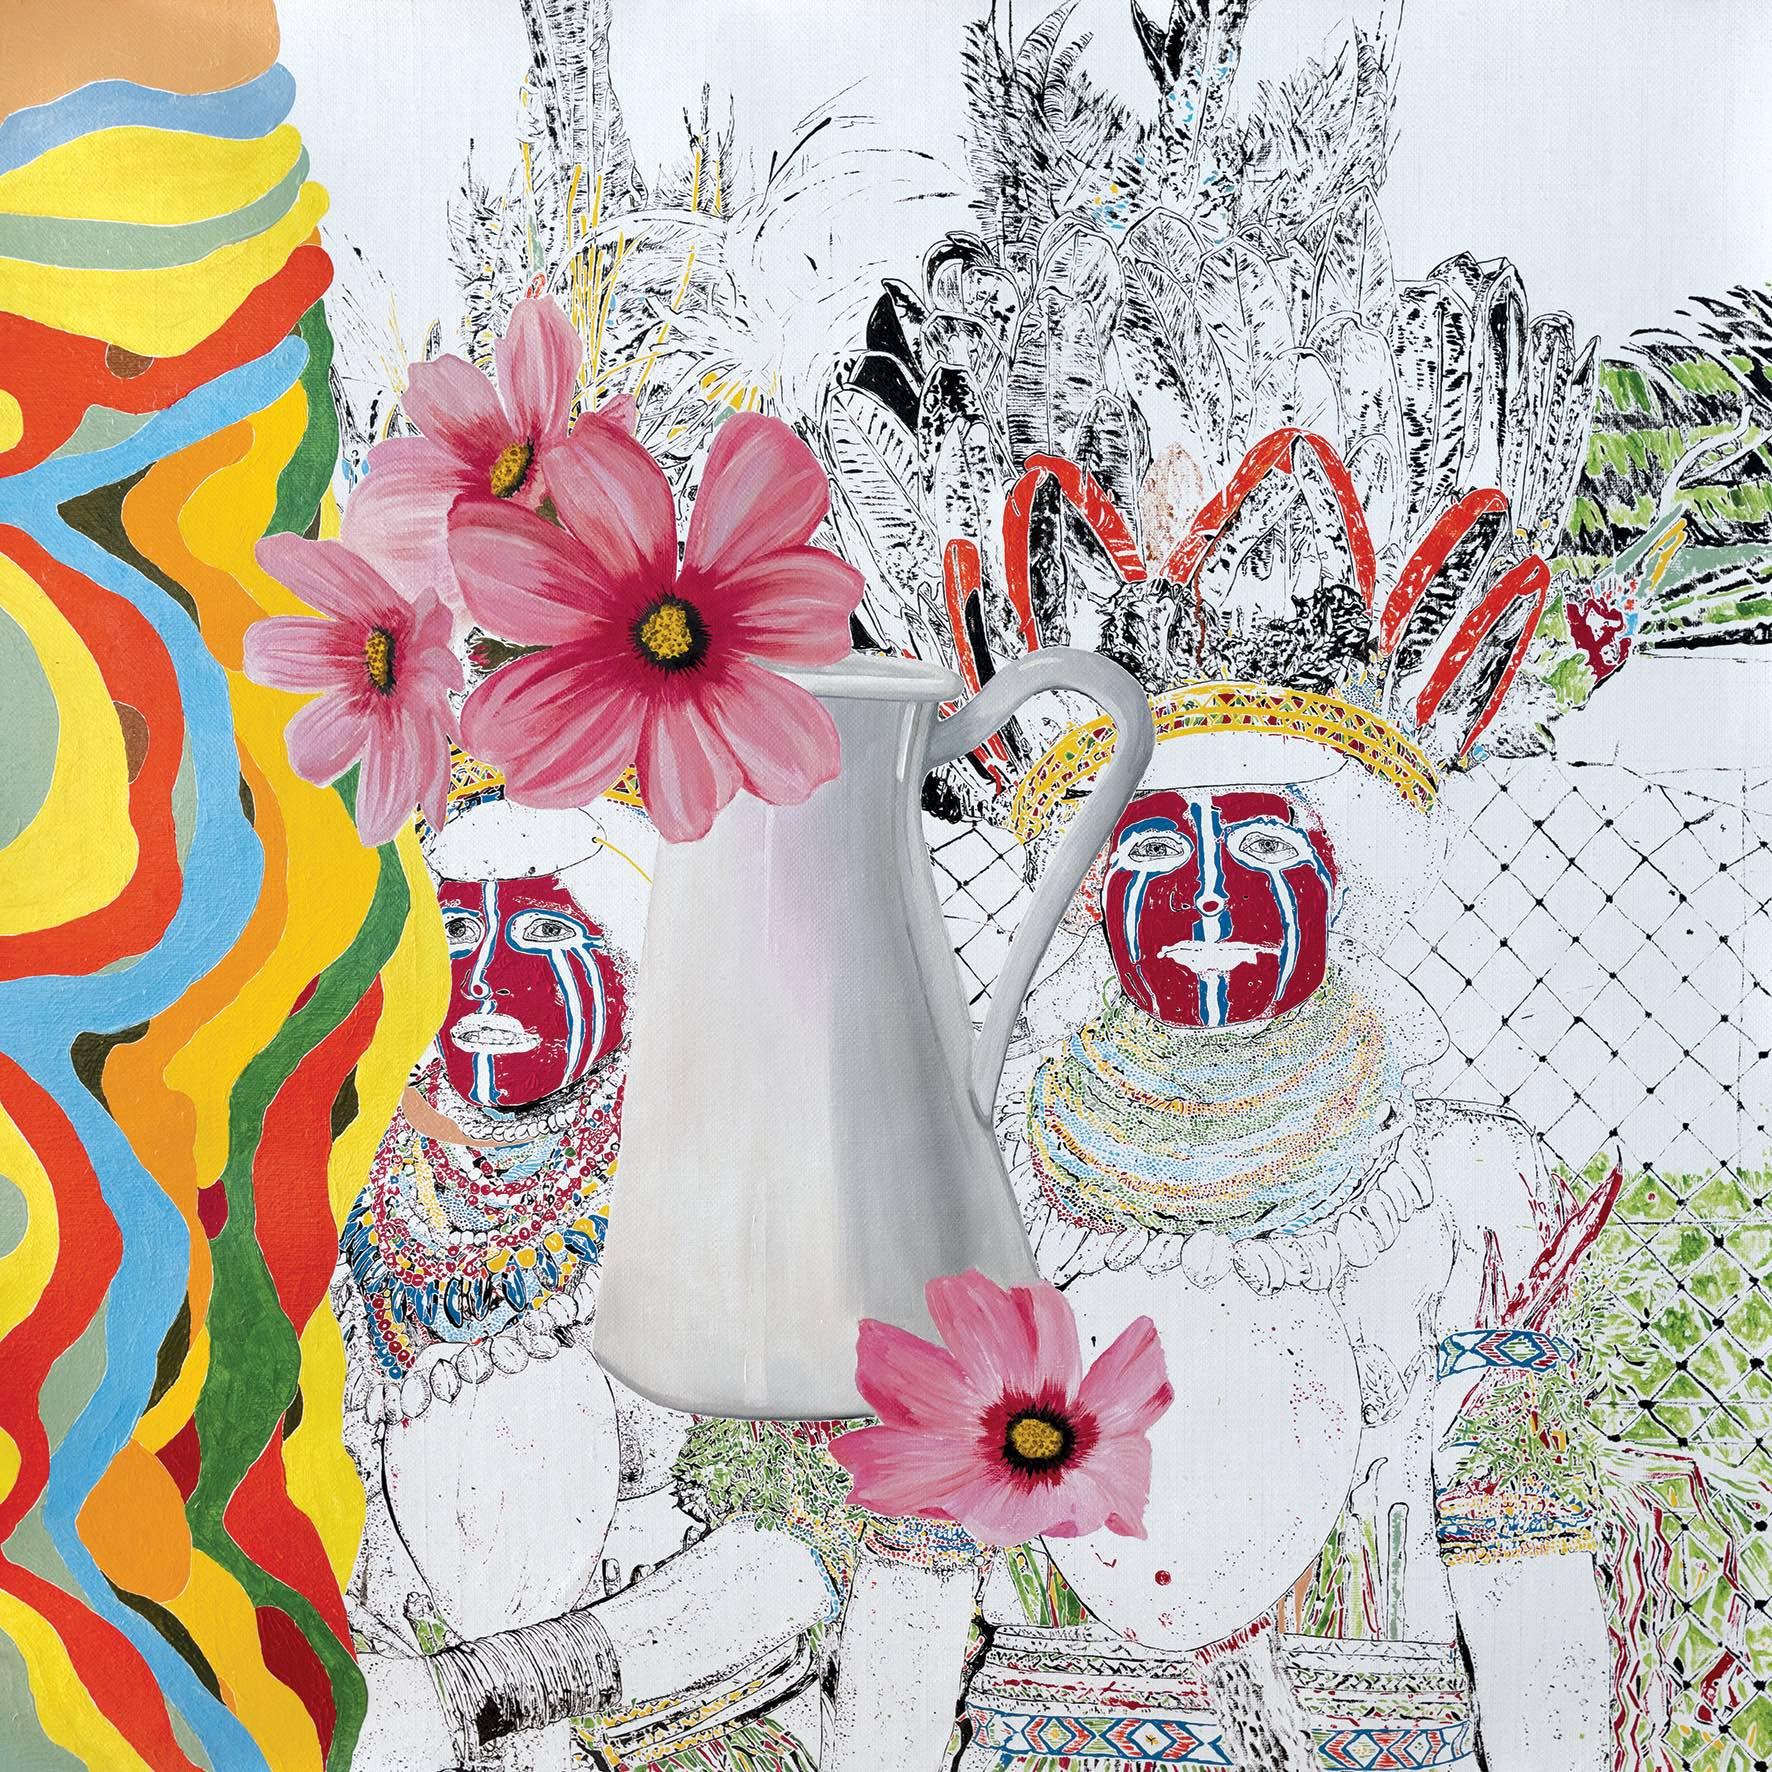 Maurizio Cannavacciuolo, As a fallen flower, 2016 olio su tela 90 x 90 cm